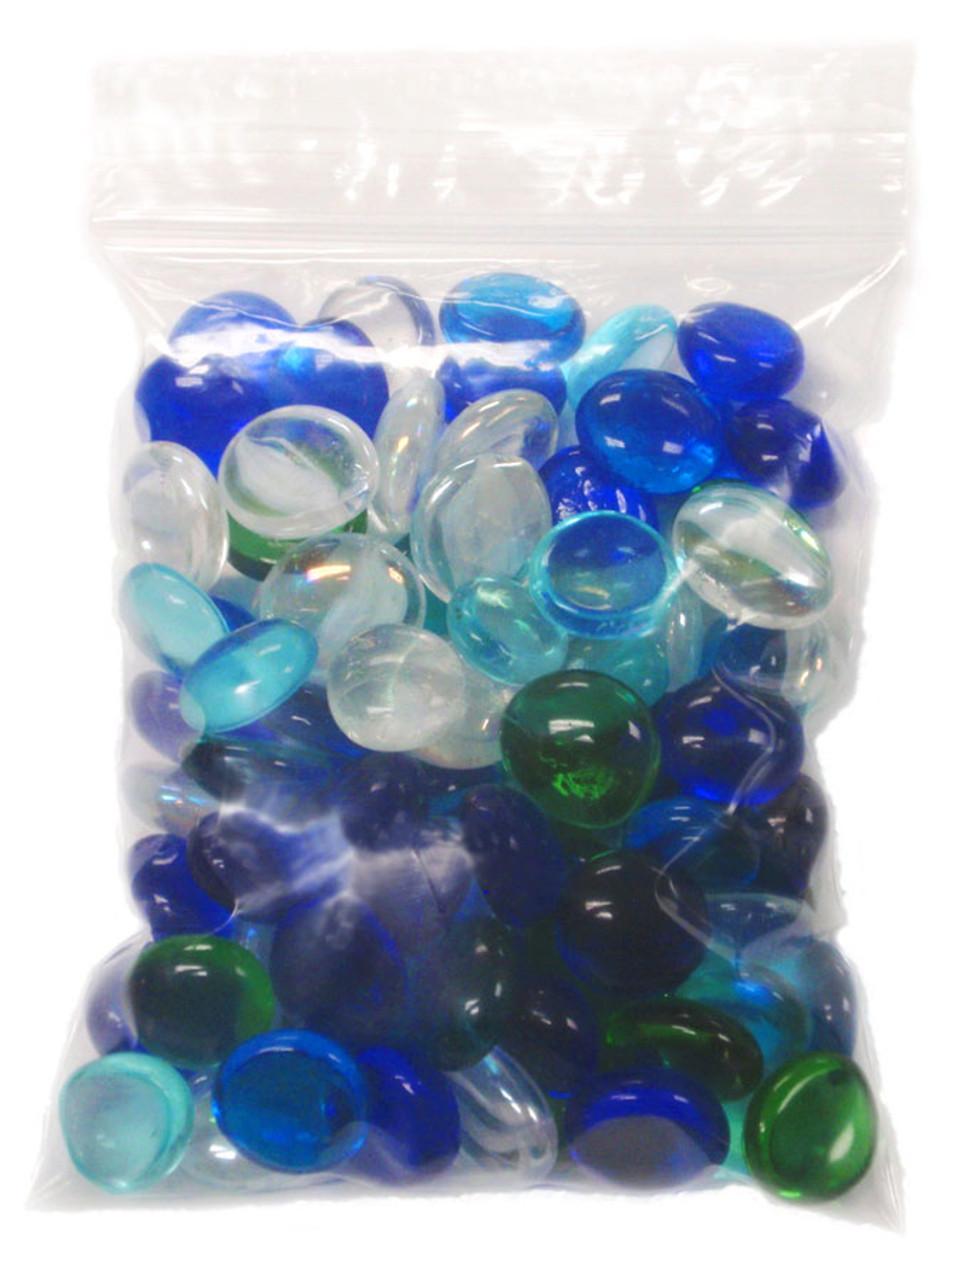 5x5 CLEAR 4MIL ZIP LOCK BAGS POLY PLASTIC RECLOSABLE SEAL MINI ZIPPER BAGGIES